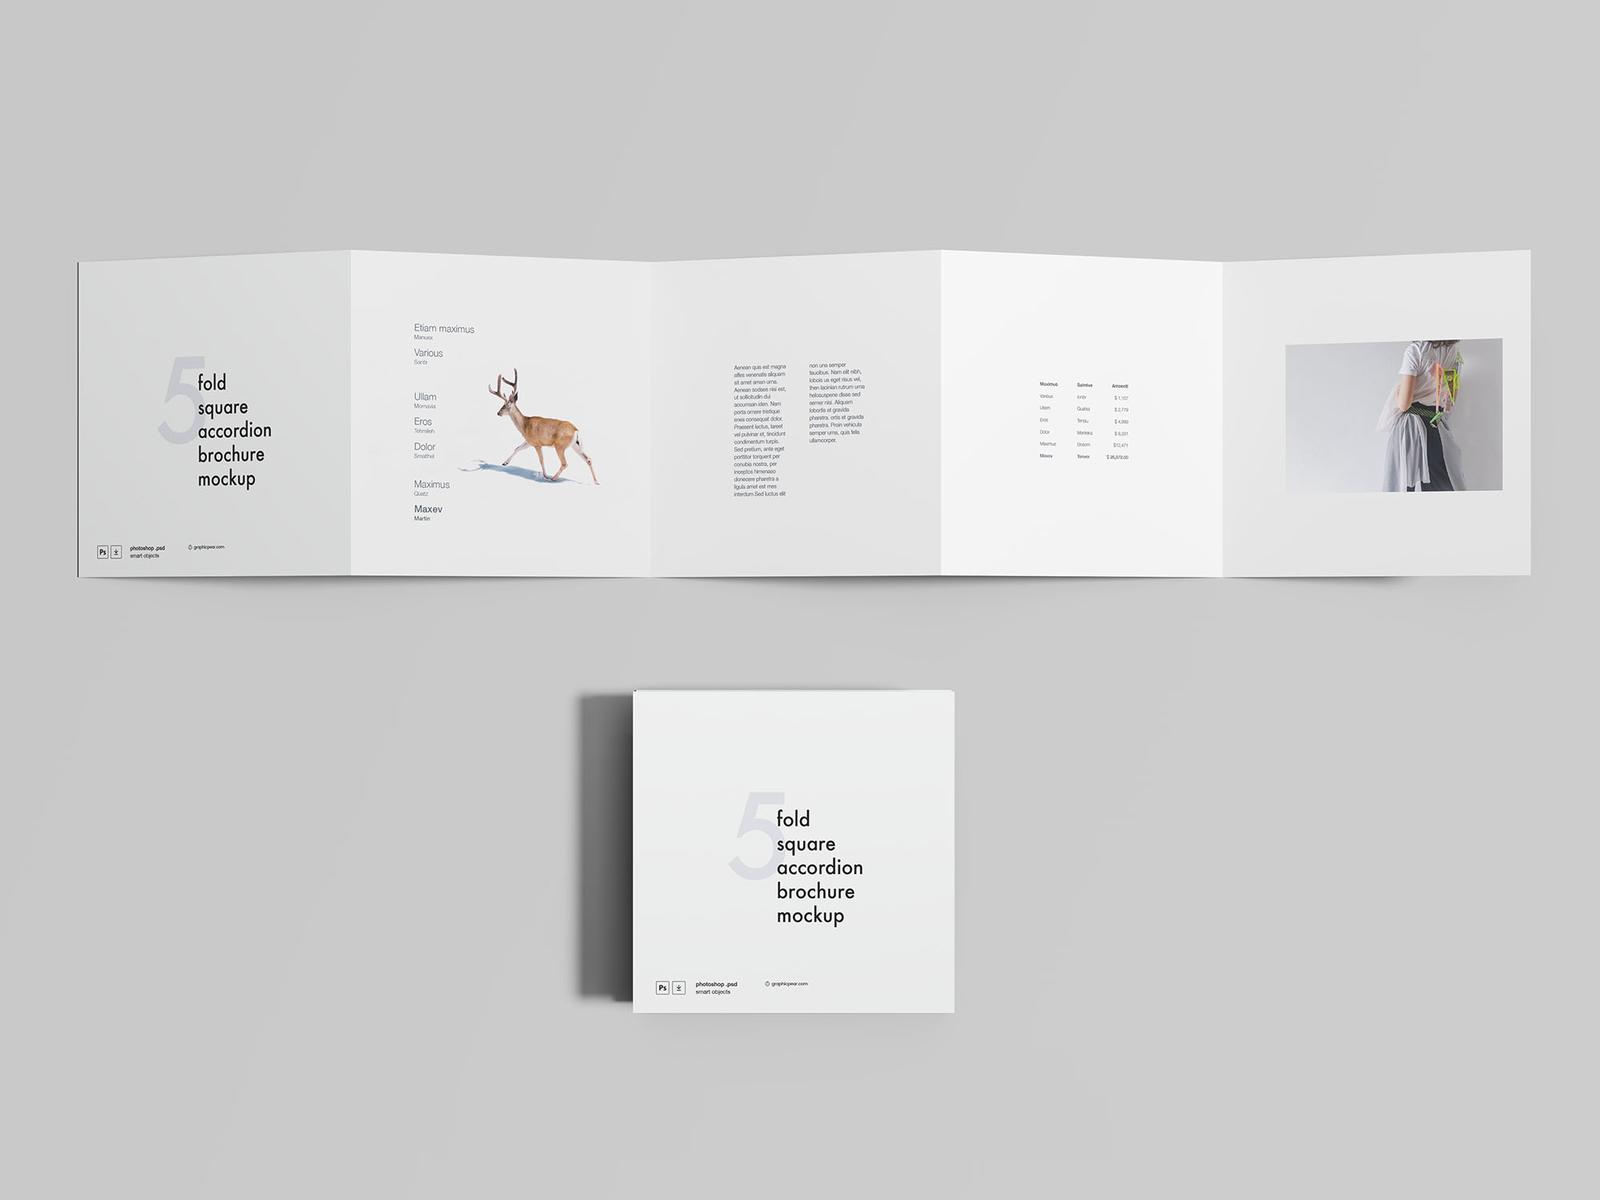 free 5 fold accordion brochure mockup by wassim dribbble